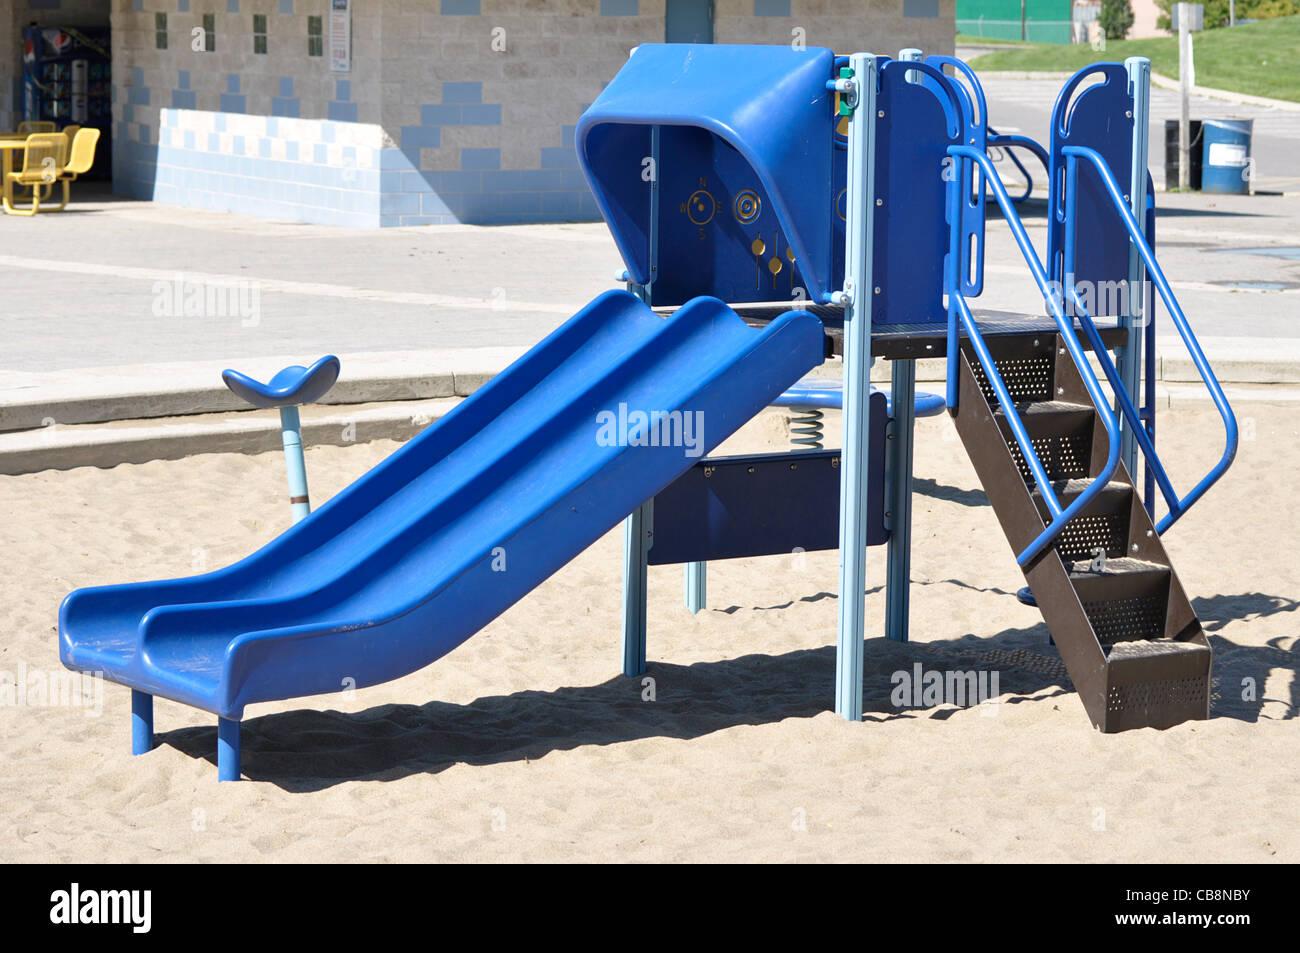 Slide in Children's Playground - Stock Image